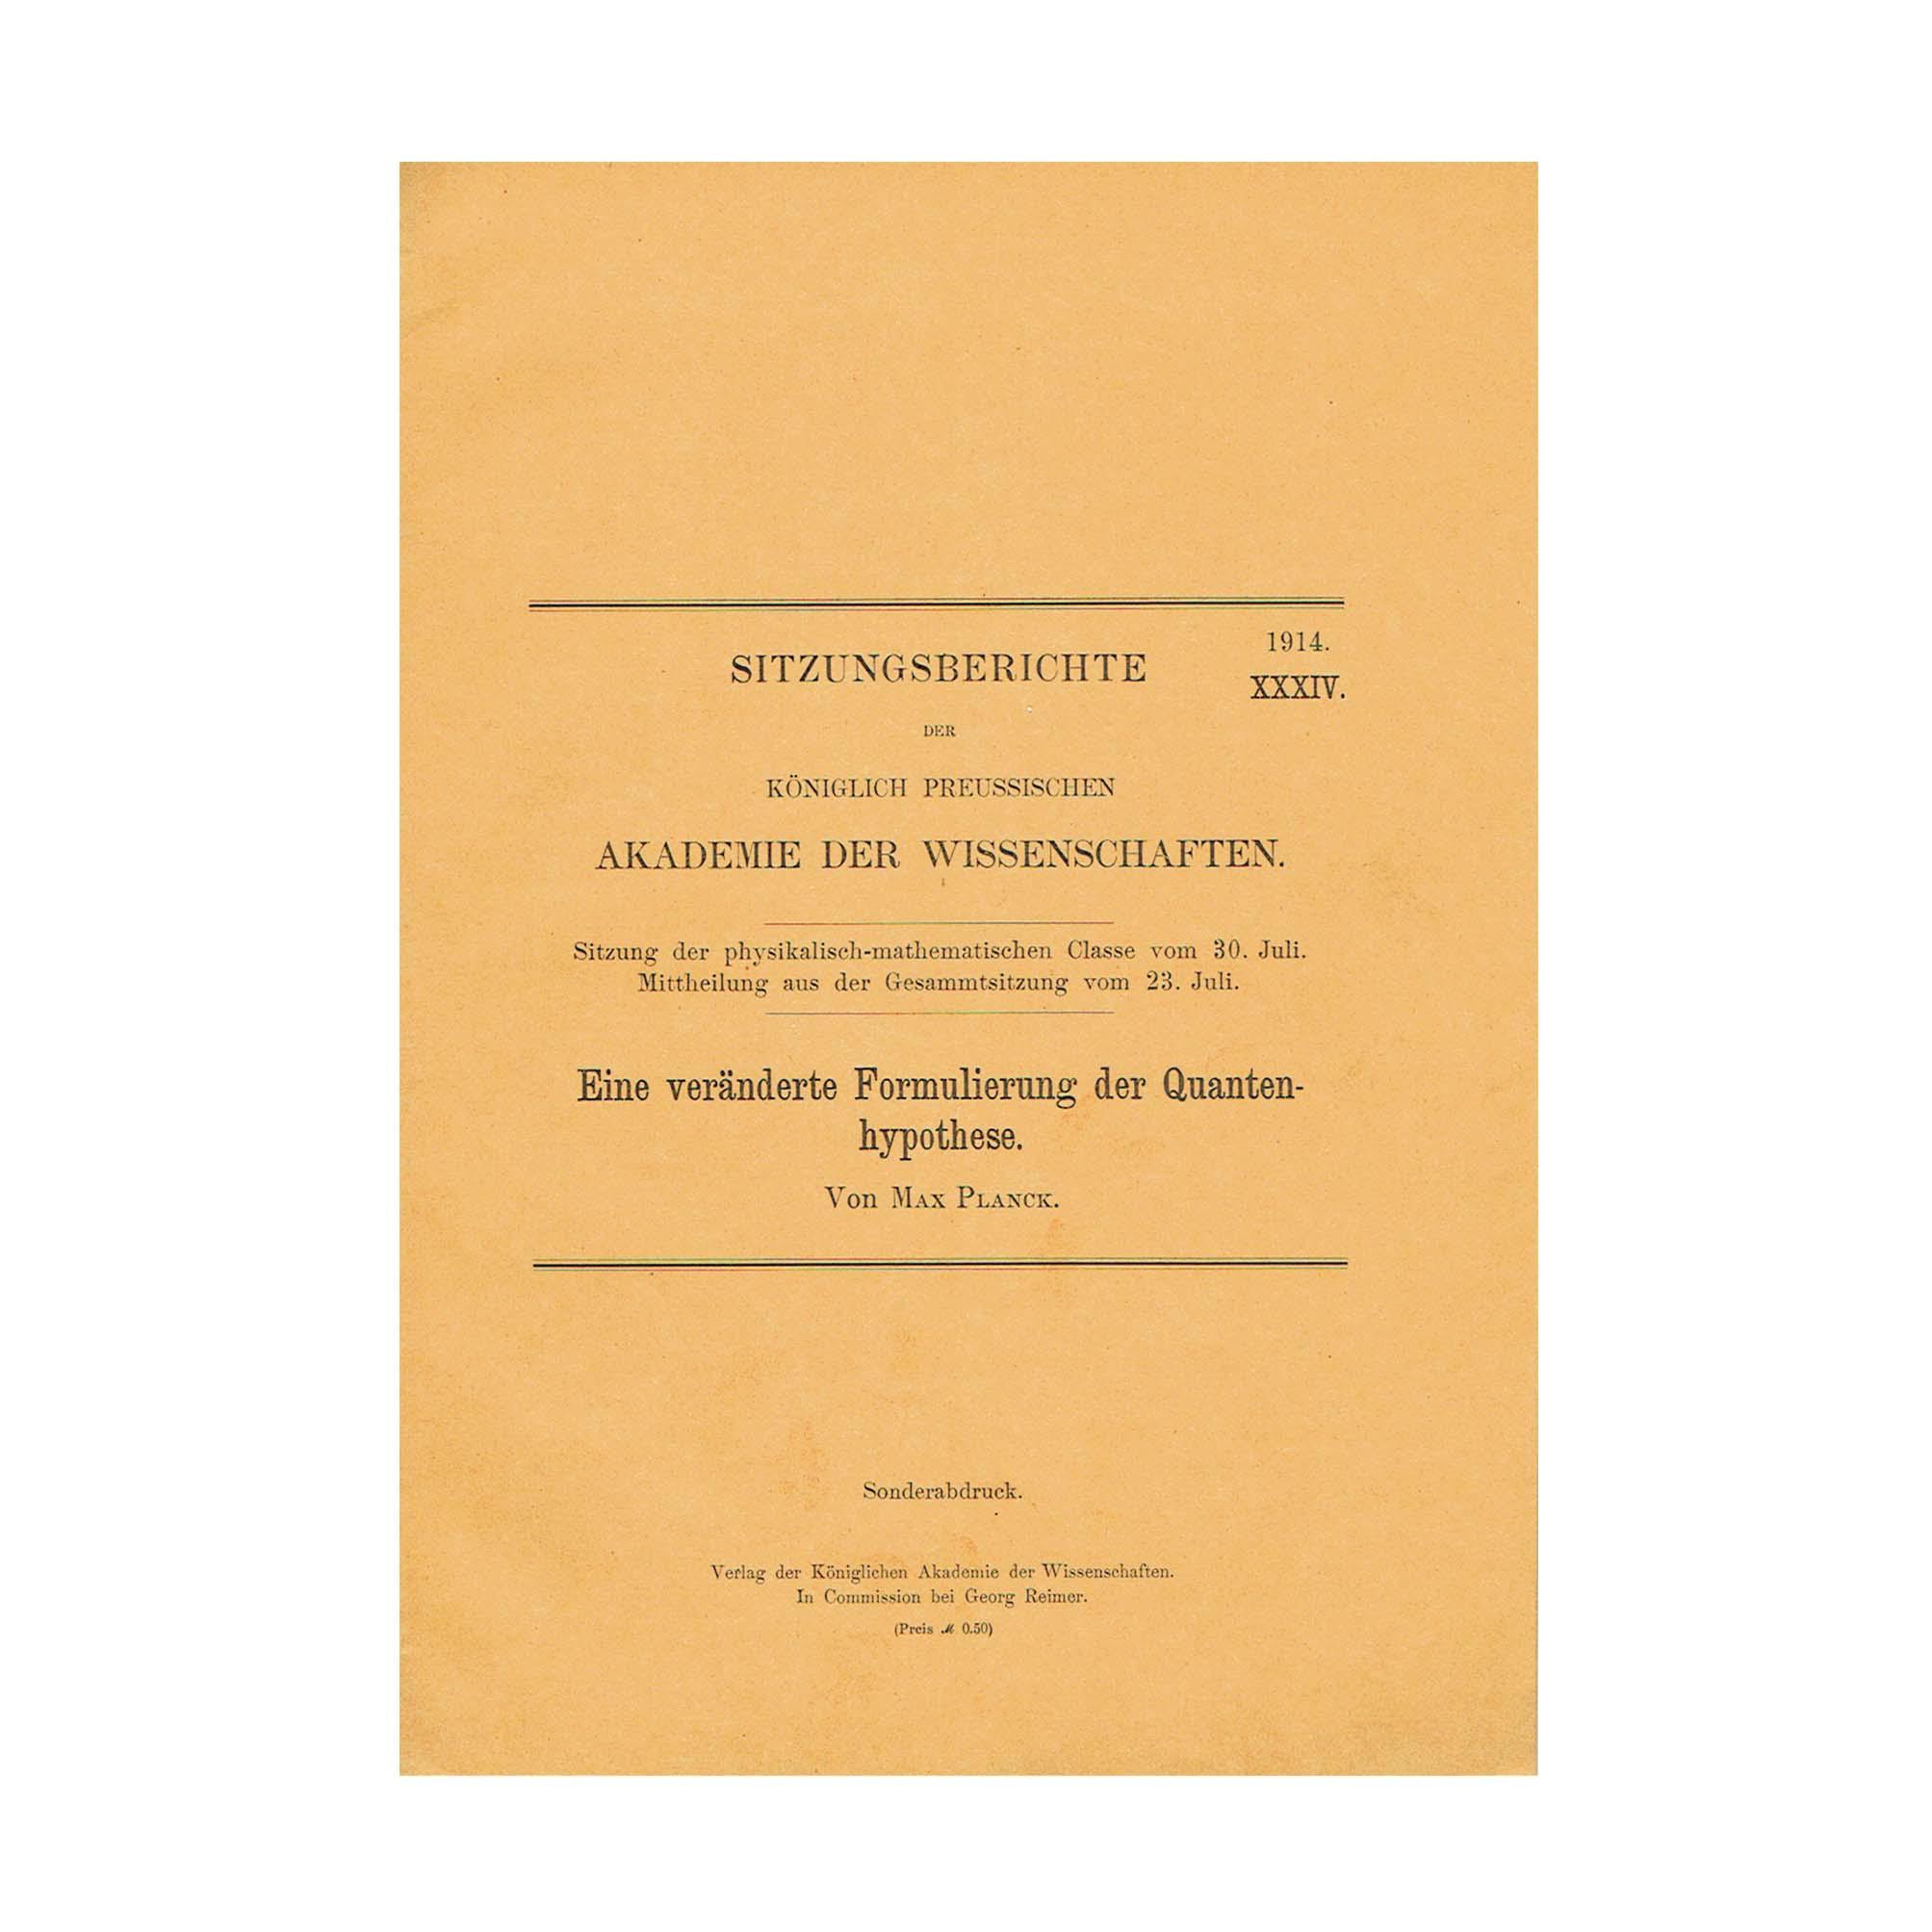 5816K-Planck-Veraenderte-Quantenhypothese-1914-Front-Cover-N.jpeg